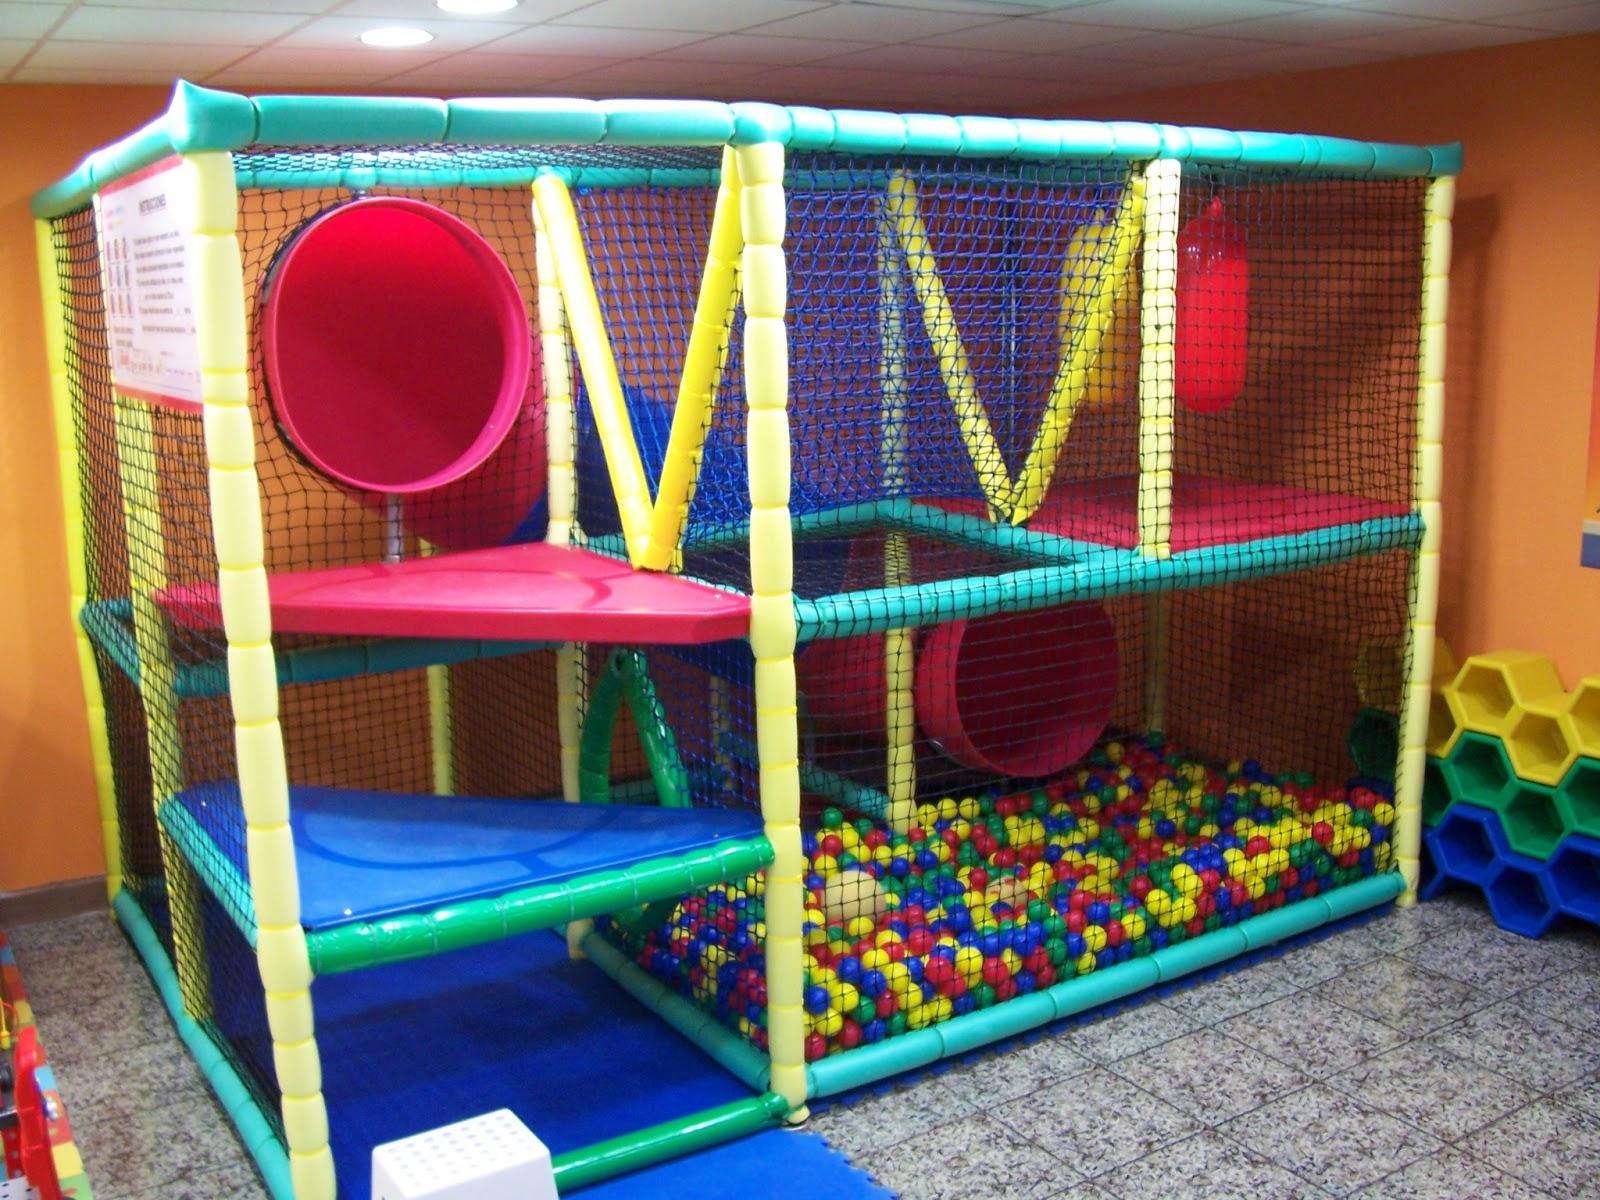 Parques de segunda mano interesan dima parques infantiles for Bolas piscinas infantiles